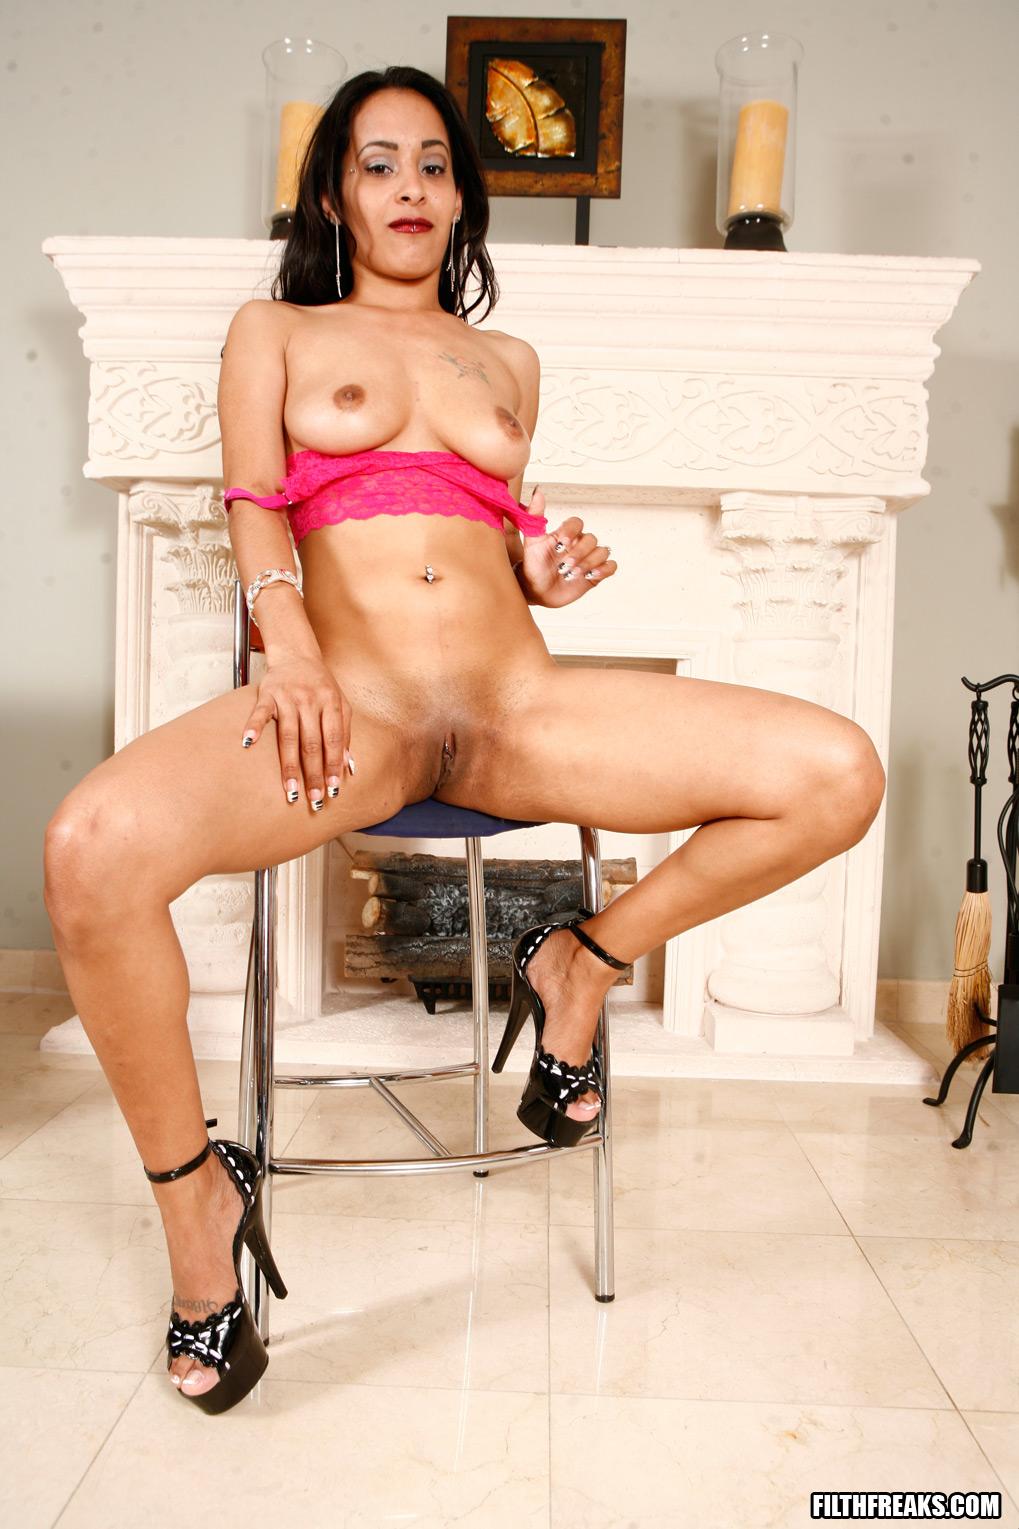 Enjoys Some Tight Latina